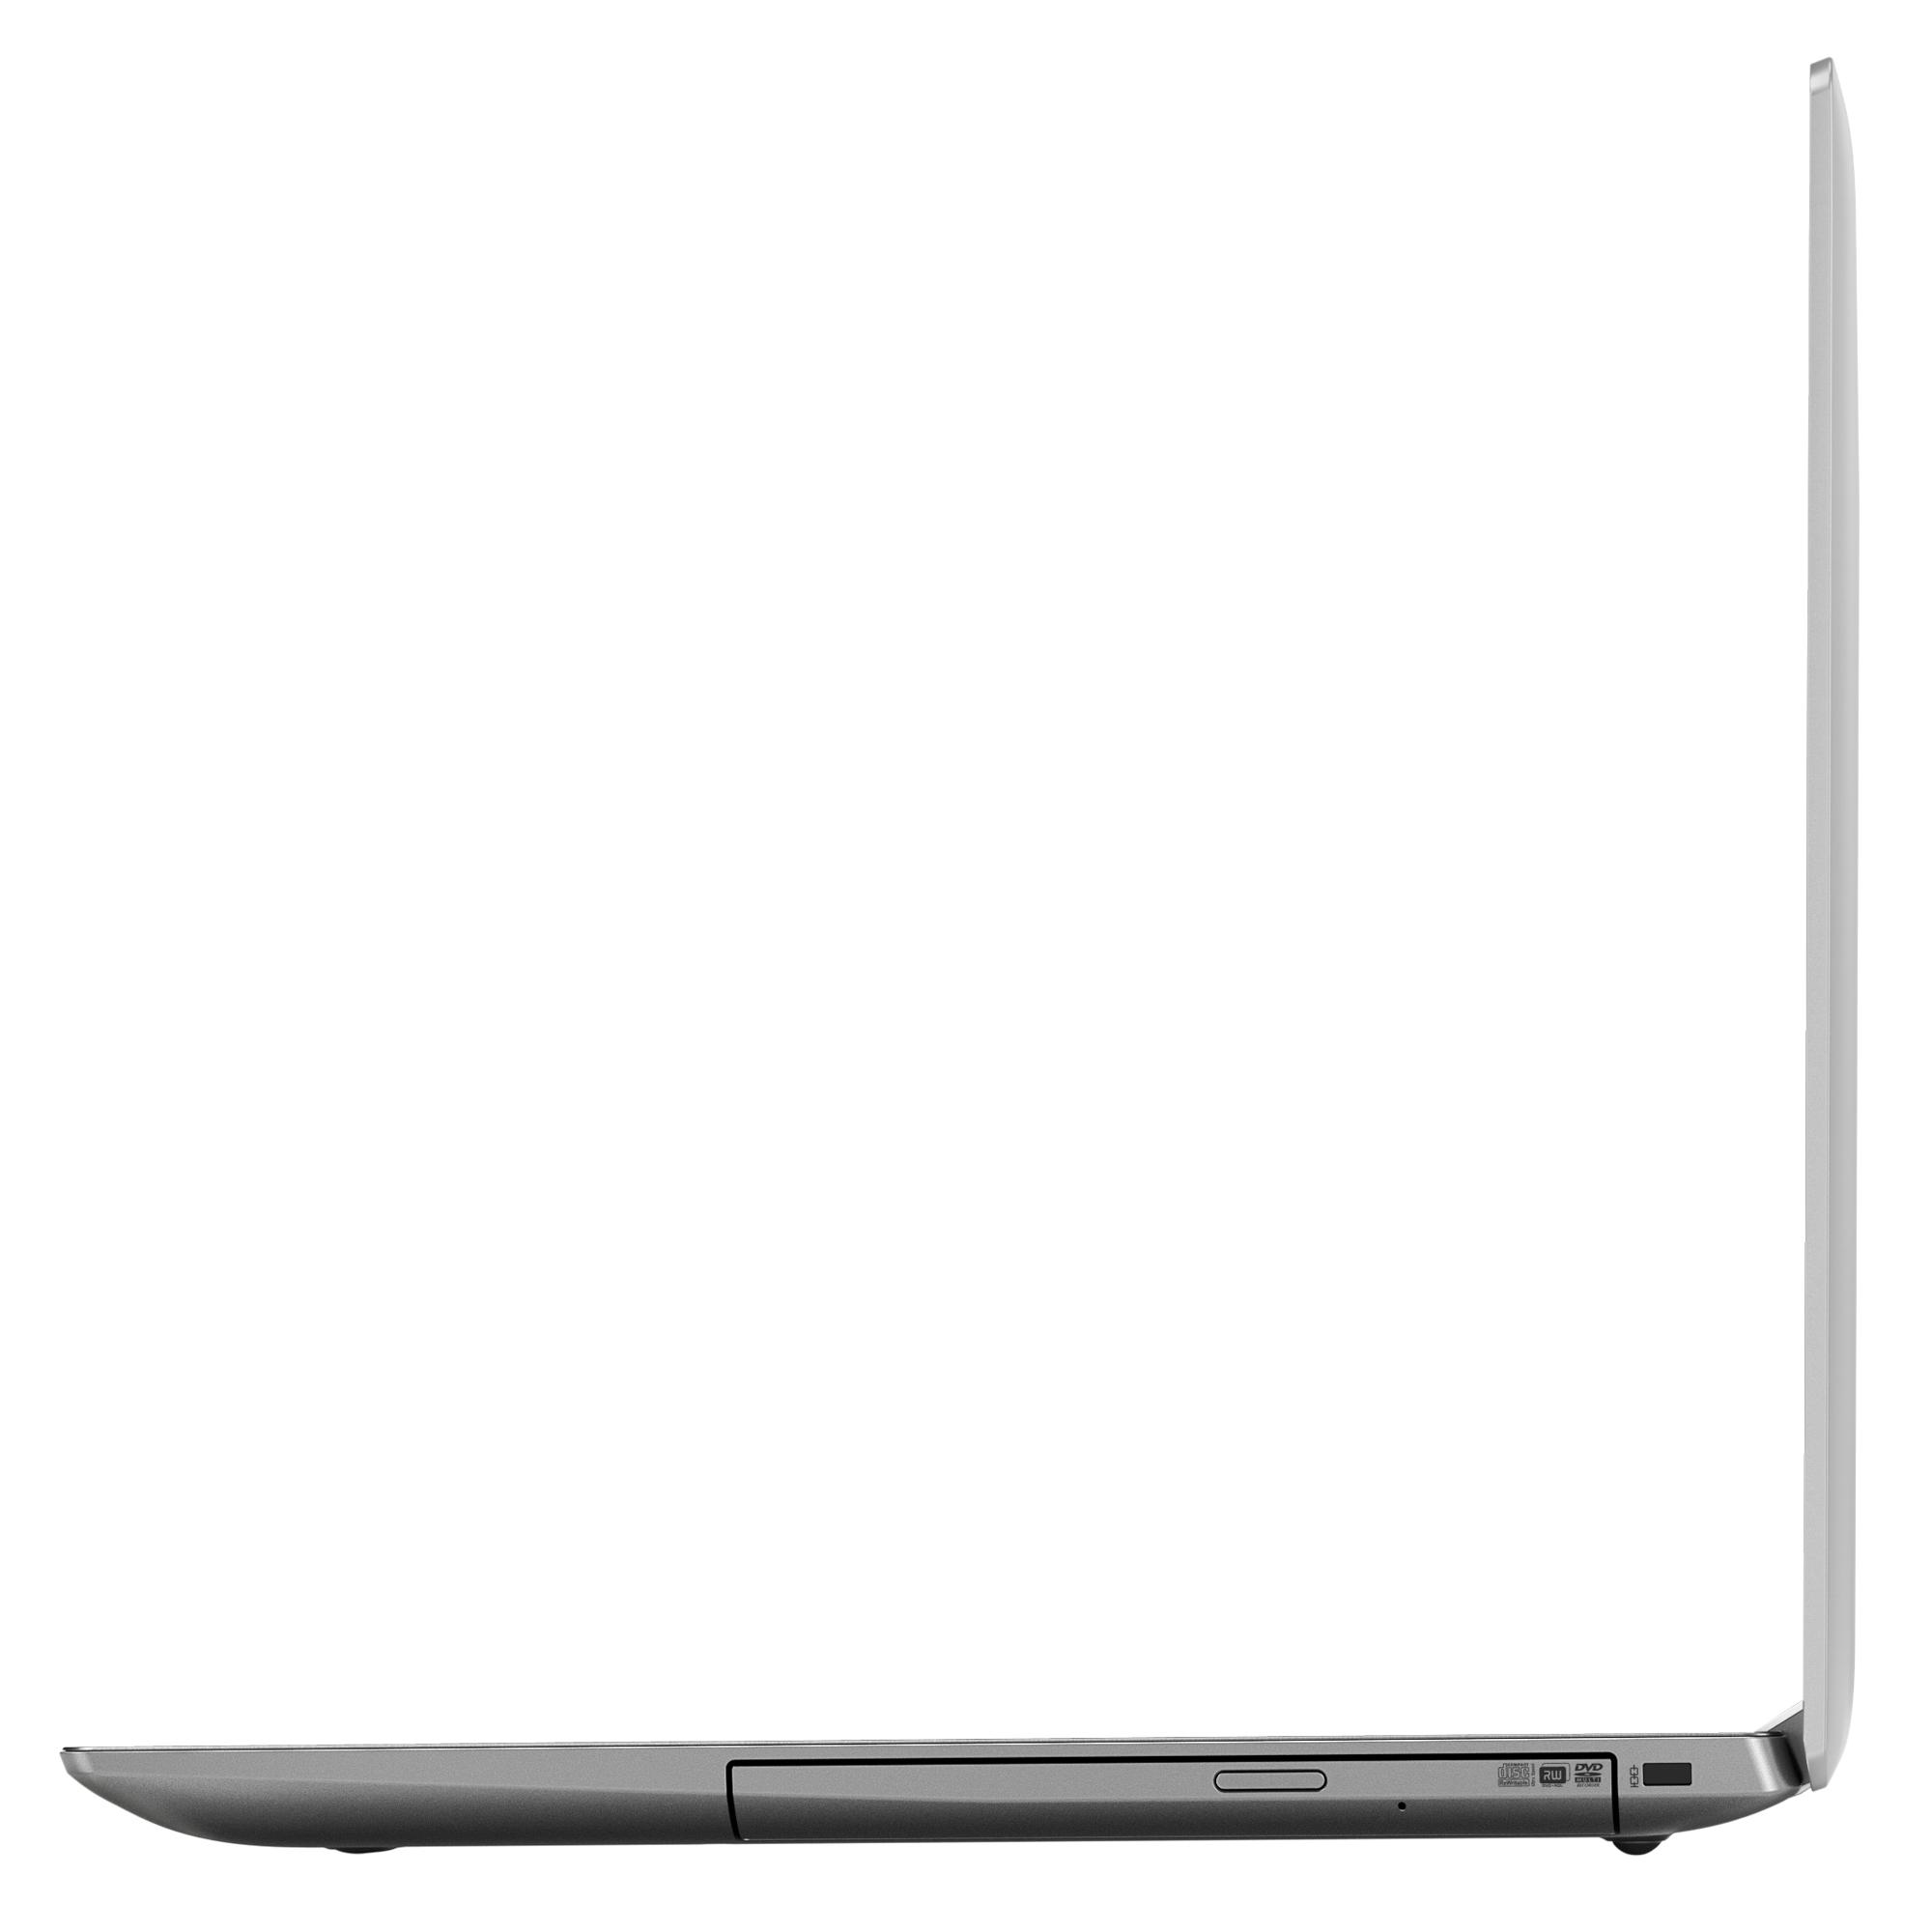 Фото  Ноутбук Lenovo ideapad 330-15 Platinum Grey (81DC00AARA)